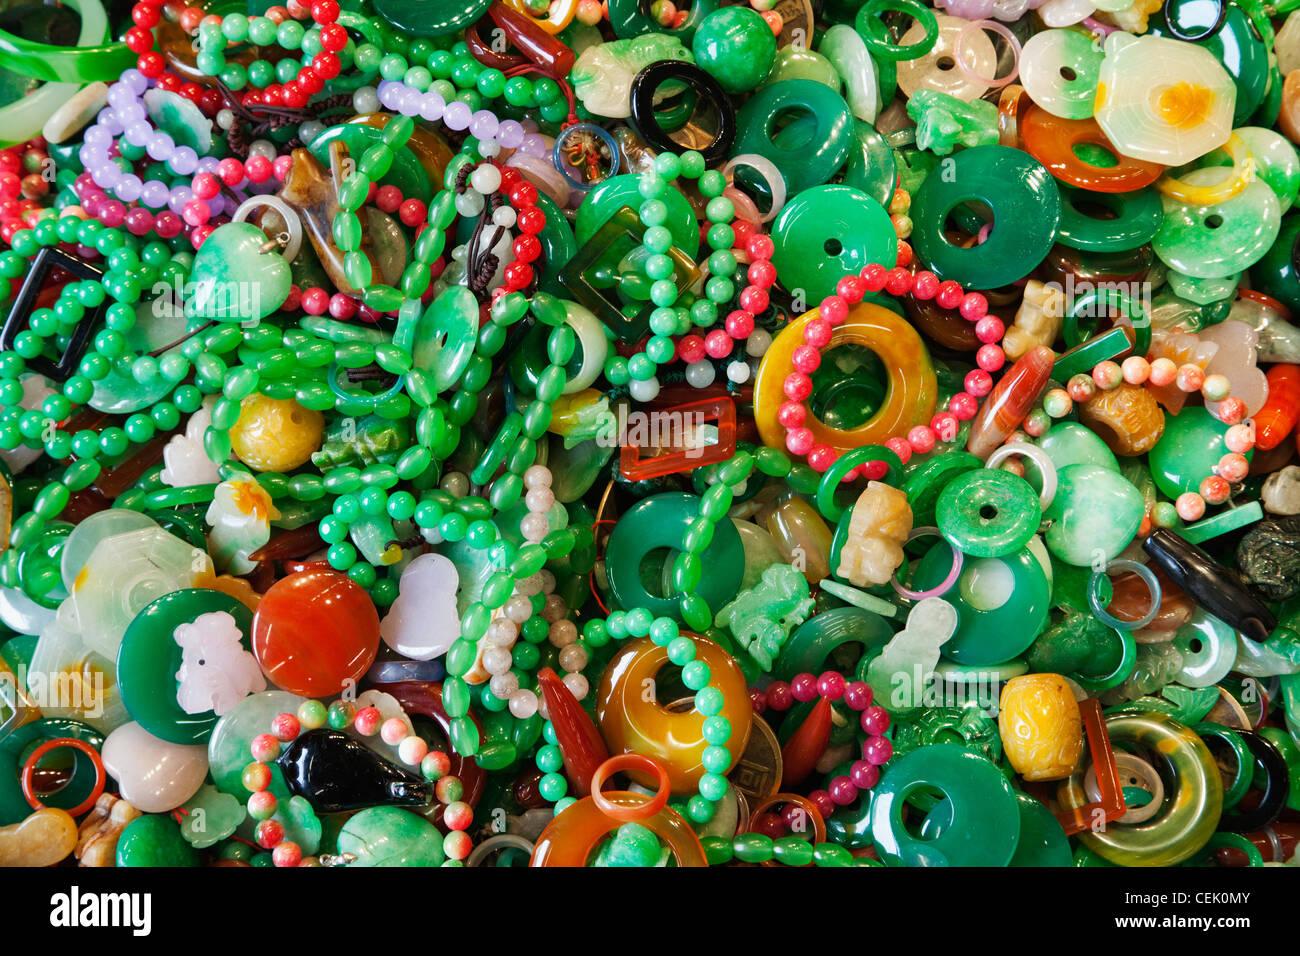 hong kongs jewellery market Alibabacom offers 20,888 hong kong jewelry jewelry wholesale cheap children jewelry wholesale trendy costume jewelry wholesale handbag costume jewelry wholesale hong kong jewelry wholesale market egyptian fashion jewelry wholesale aluminum 2017 hong kong 925 jewelry black.